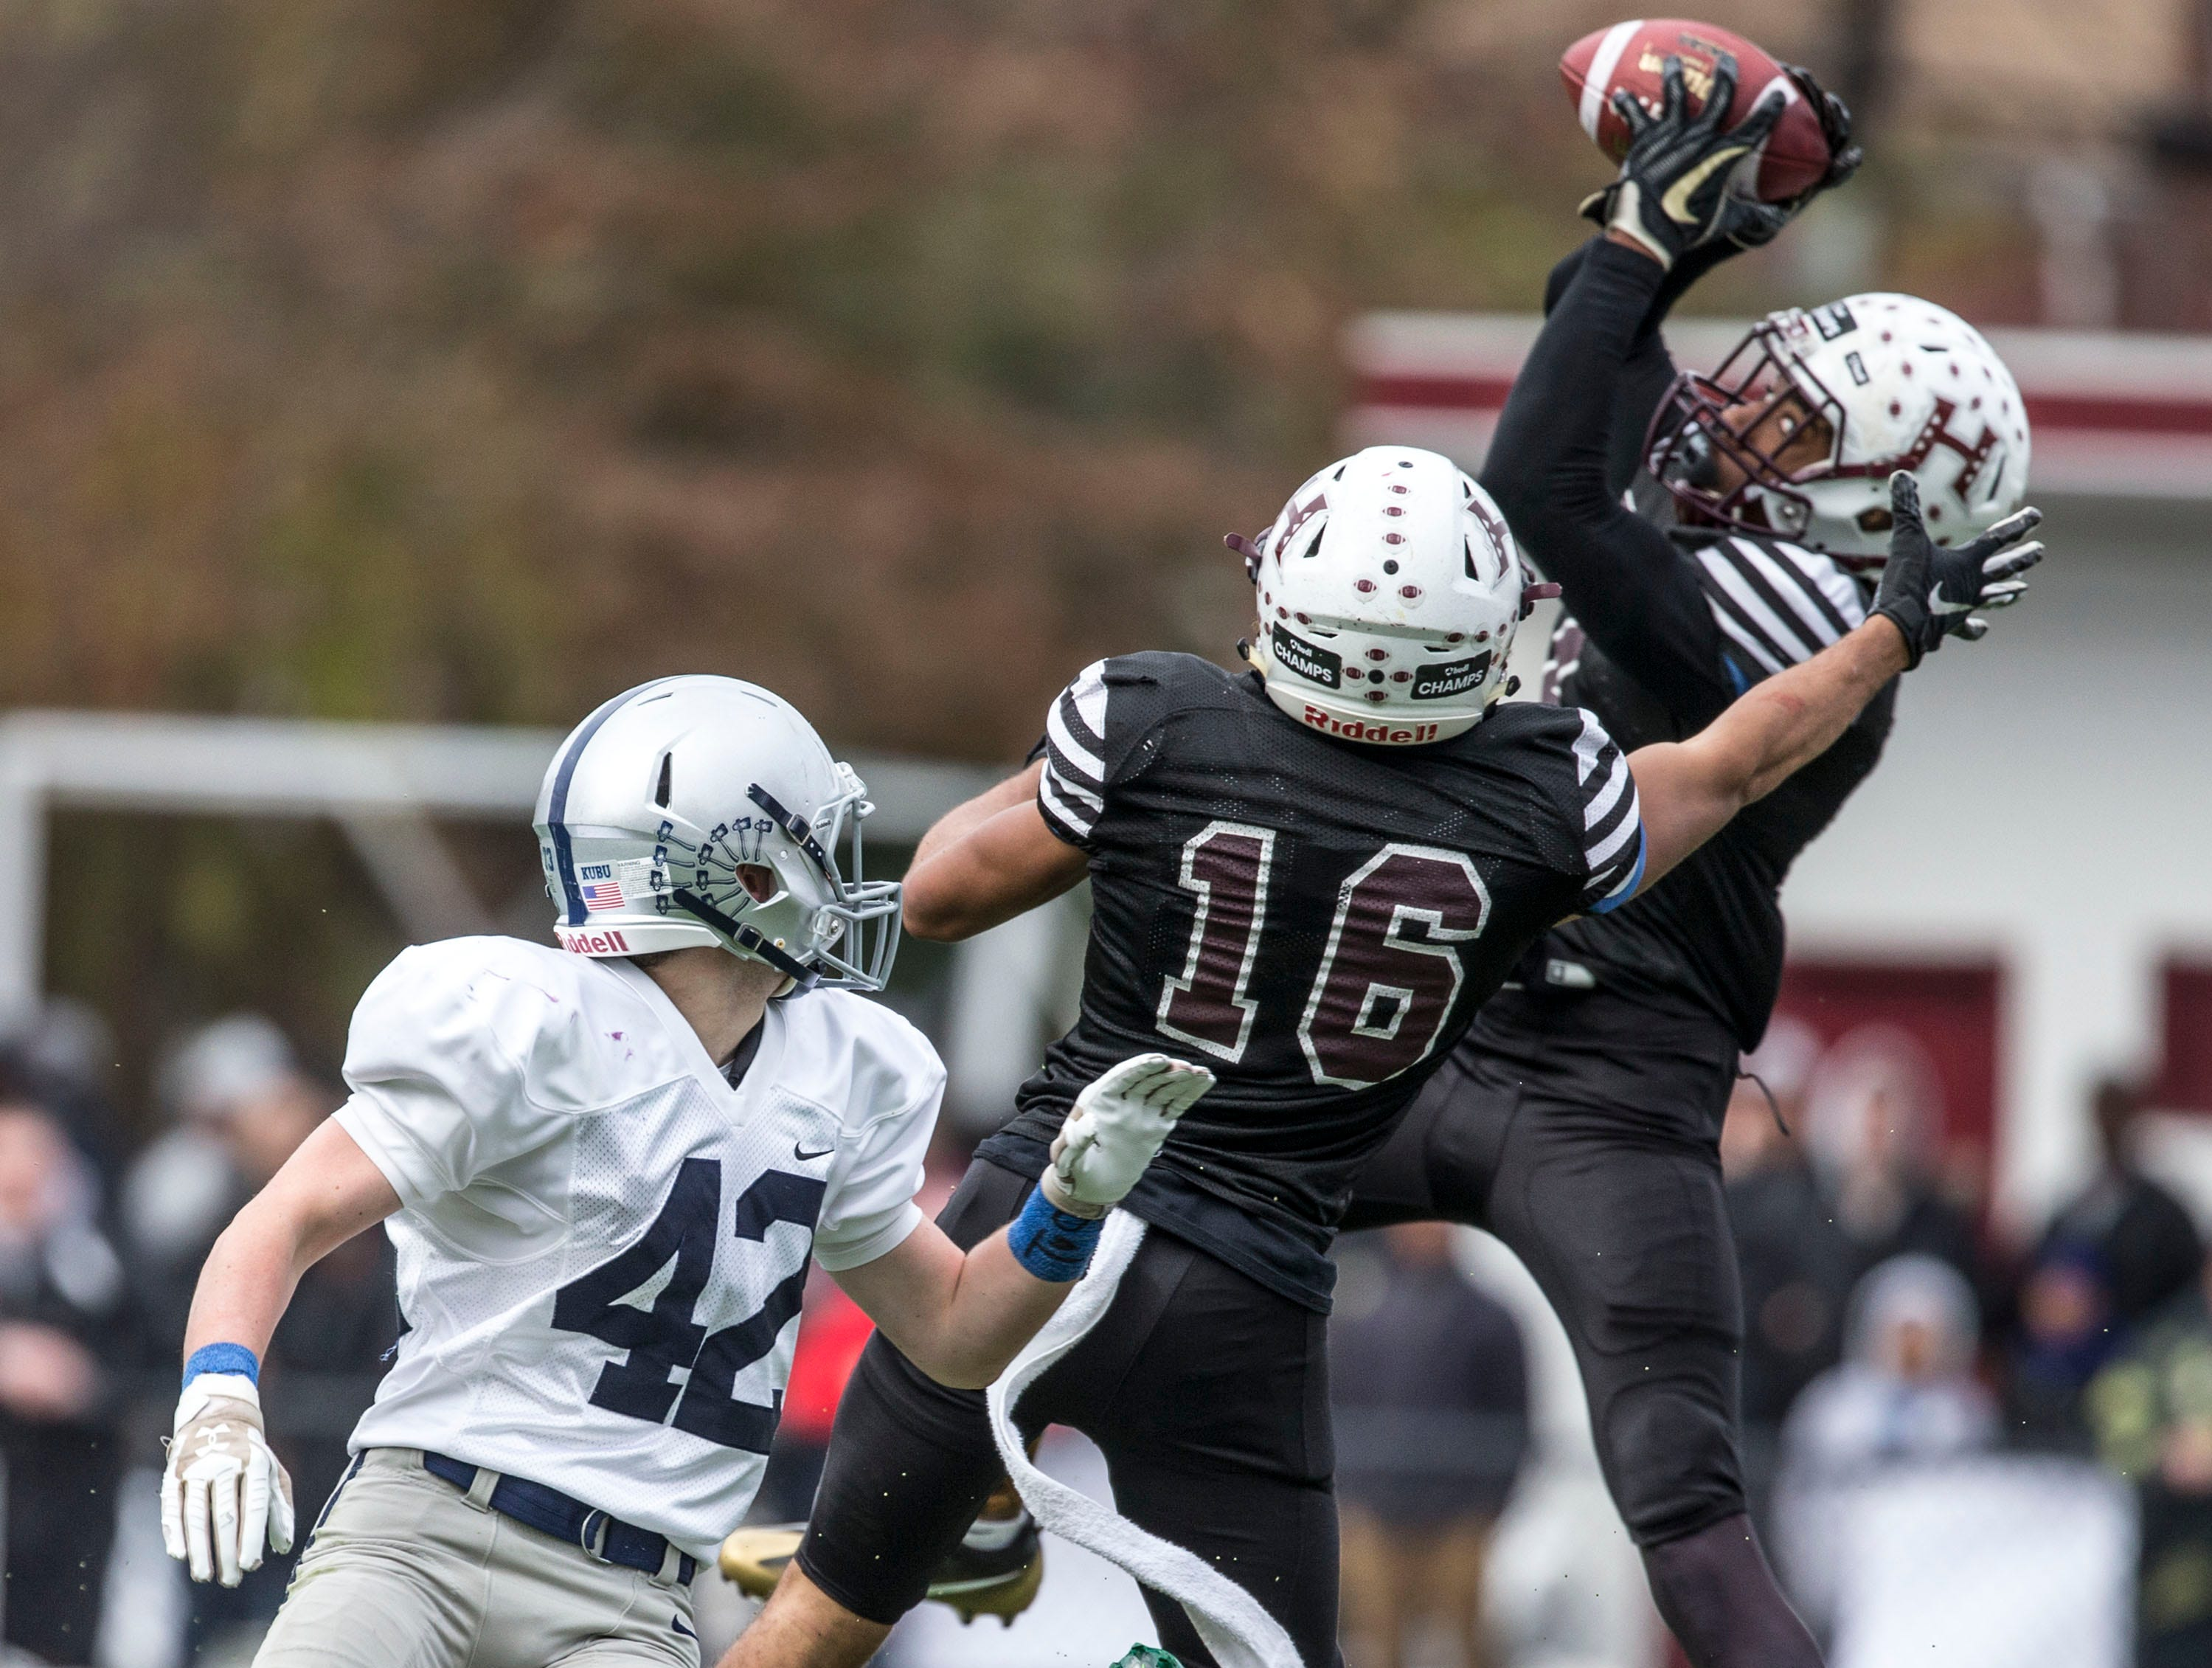 Manasquan falls to Hillside in the NJSIAA Central Group II championship football game. Hillside, NJSaturday, November, 17, 2018